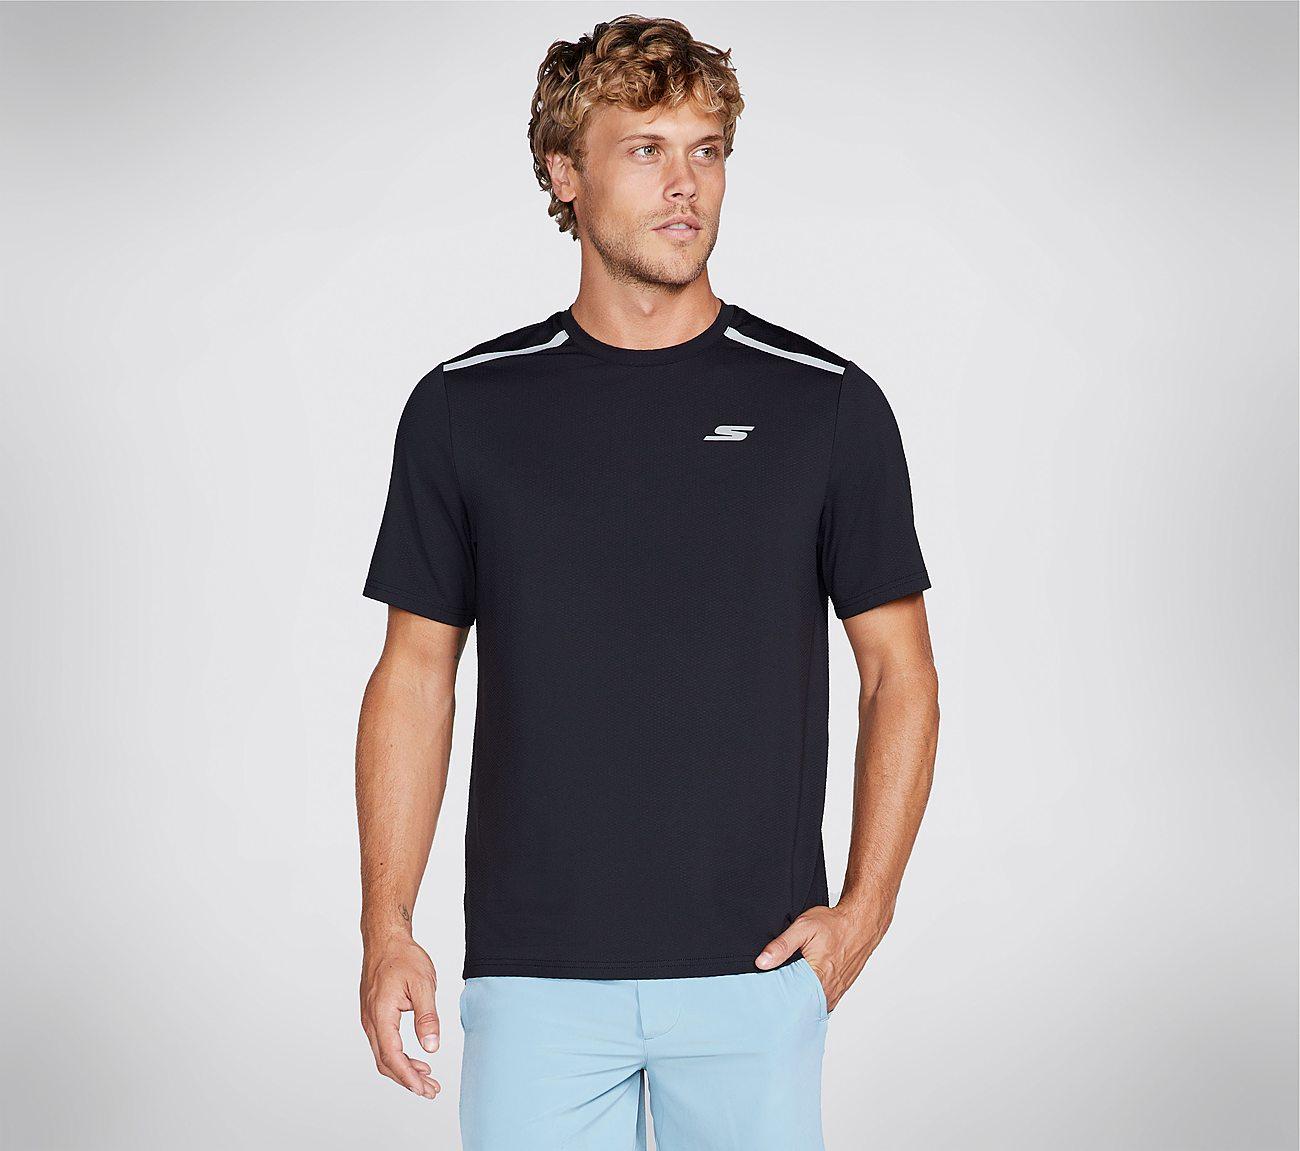 Skechers Apparel Foundation Tee Shirt